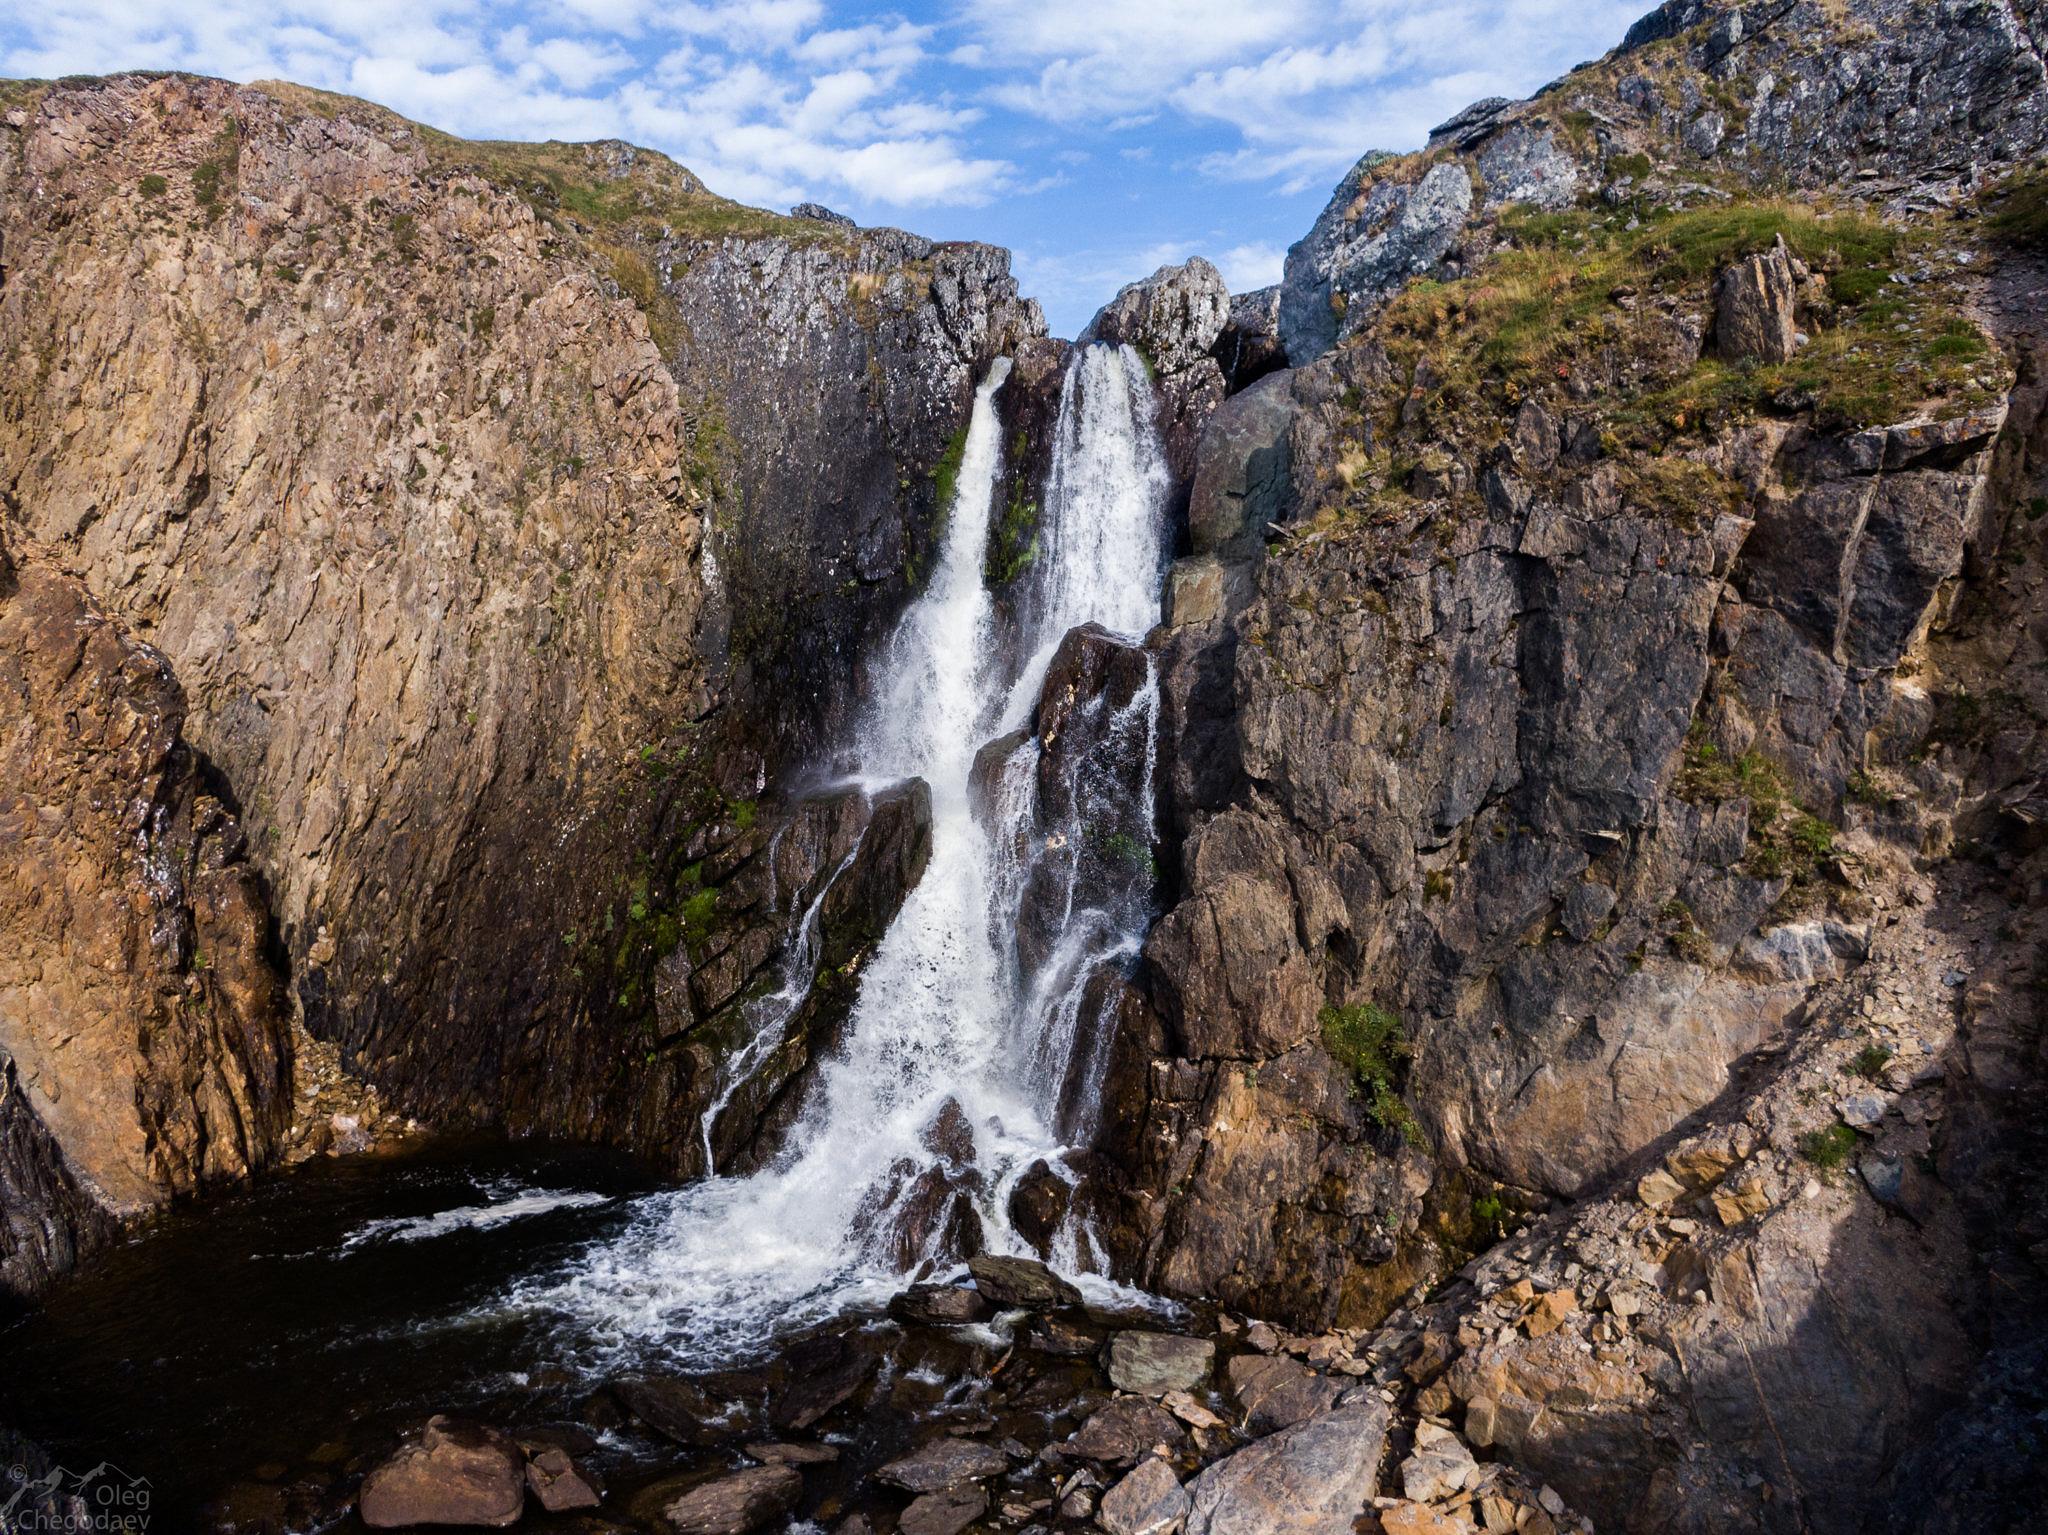 21 - метровый водопад на реке Таркаляетосё